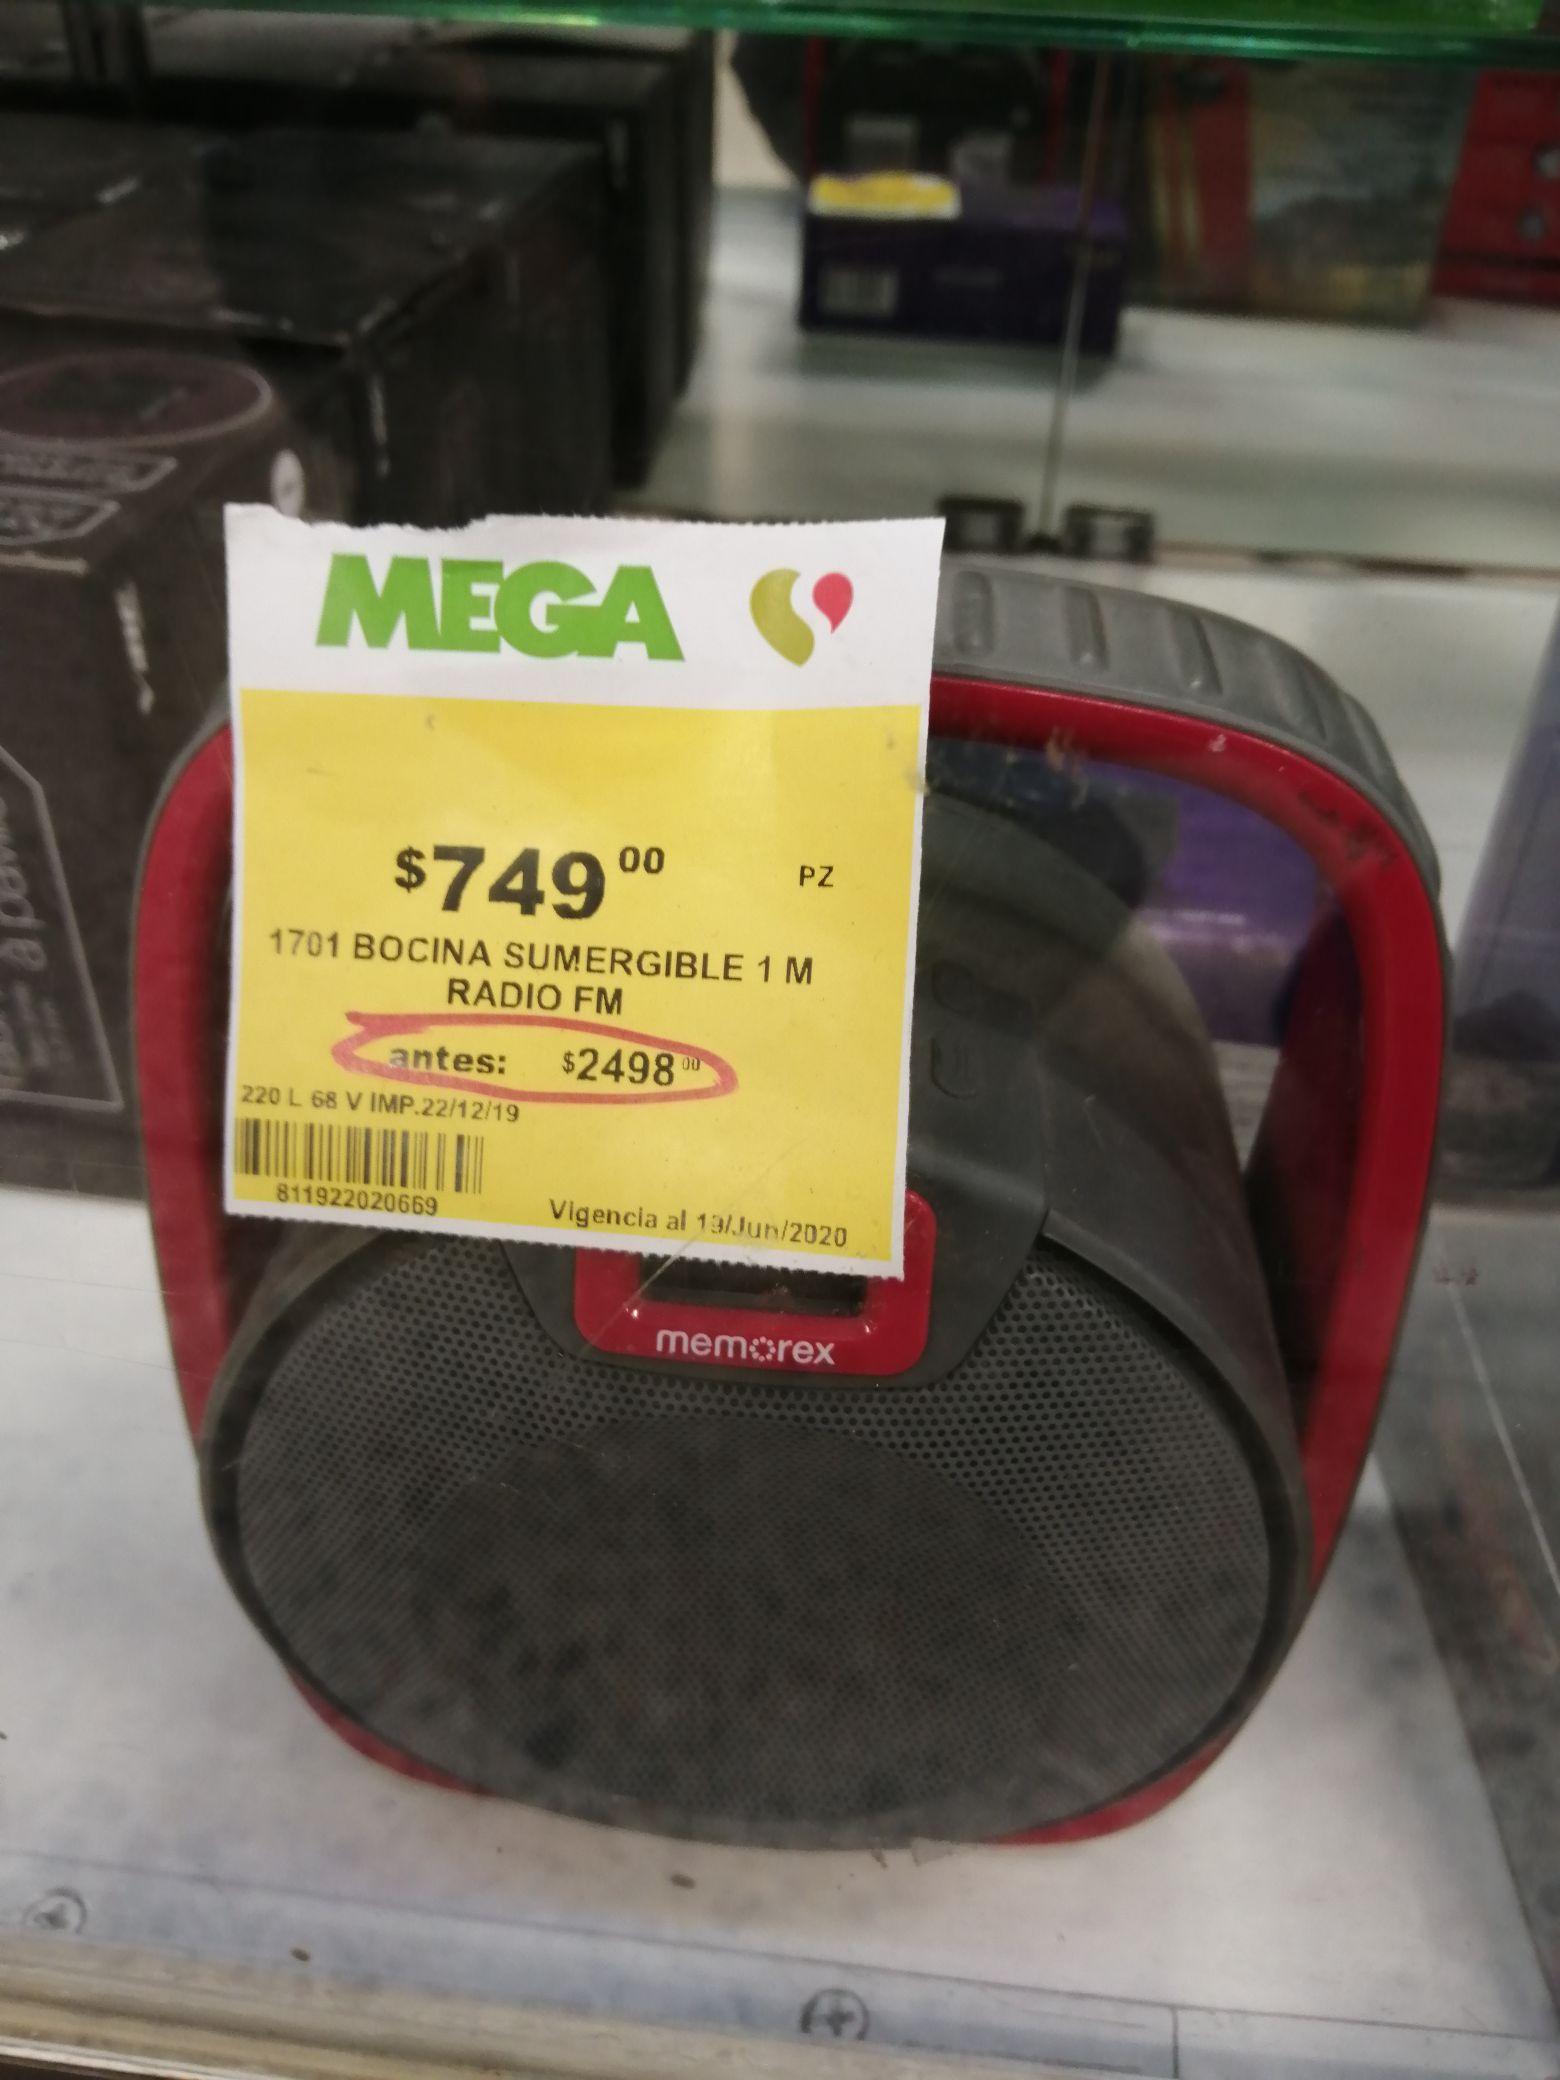 MEGA Soriana: Bocina sumergible